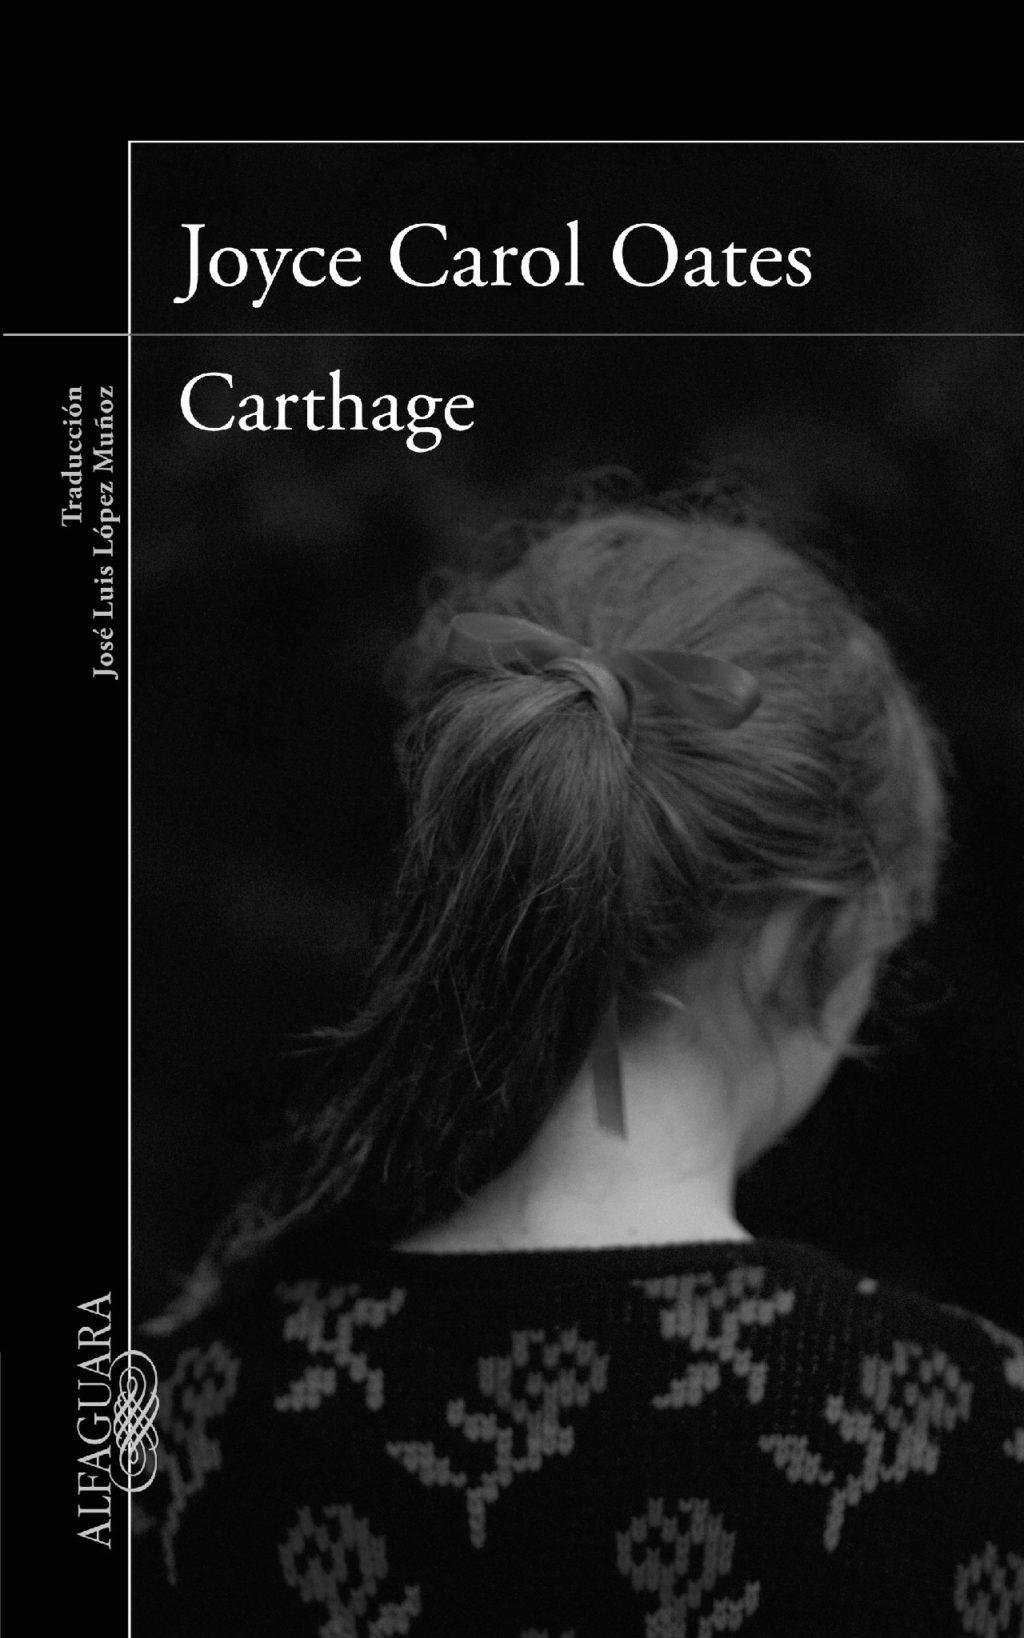 Cartaghe